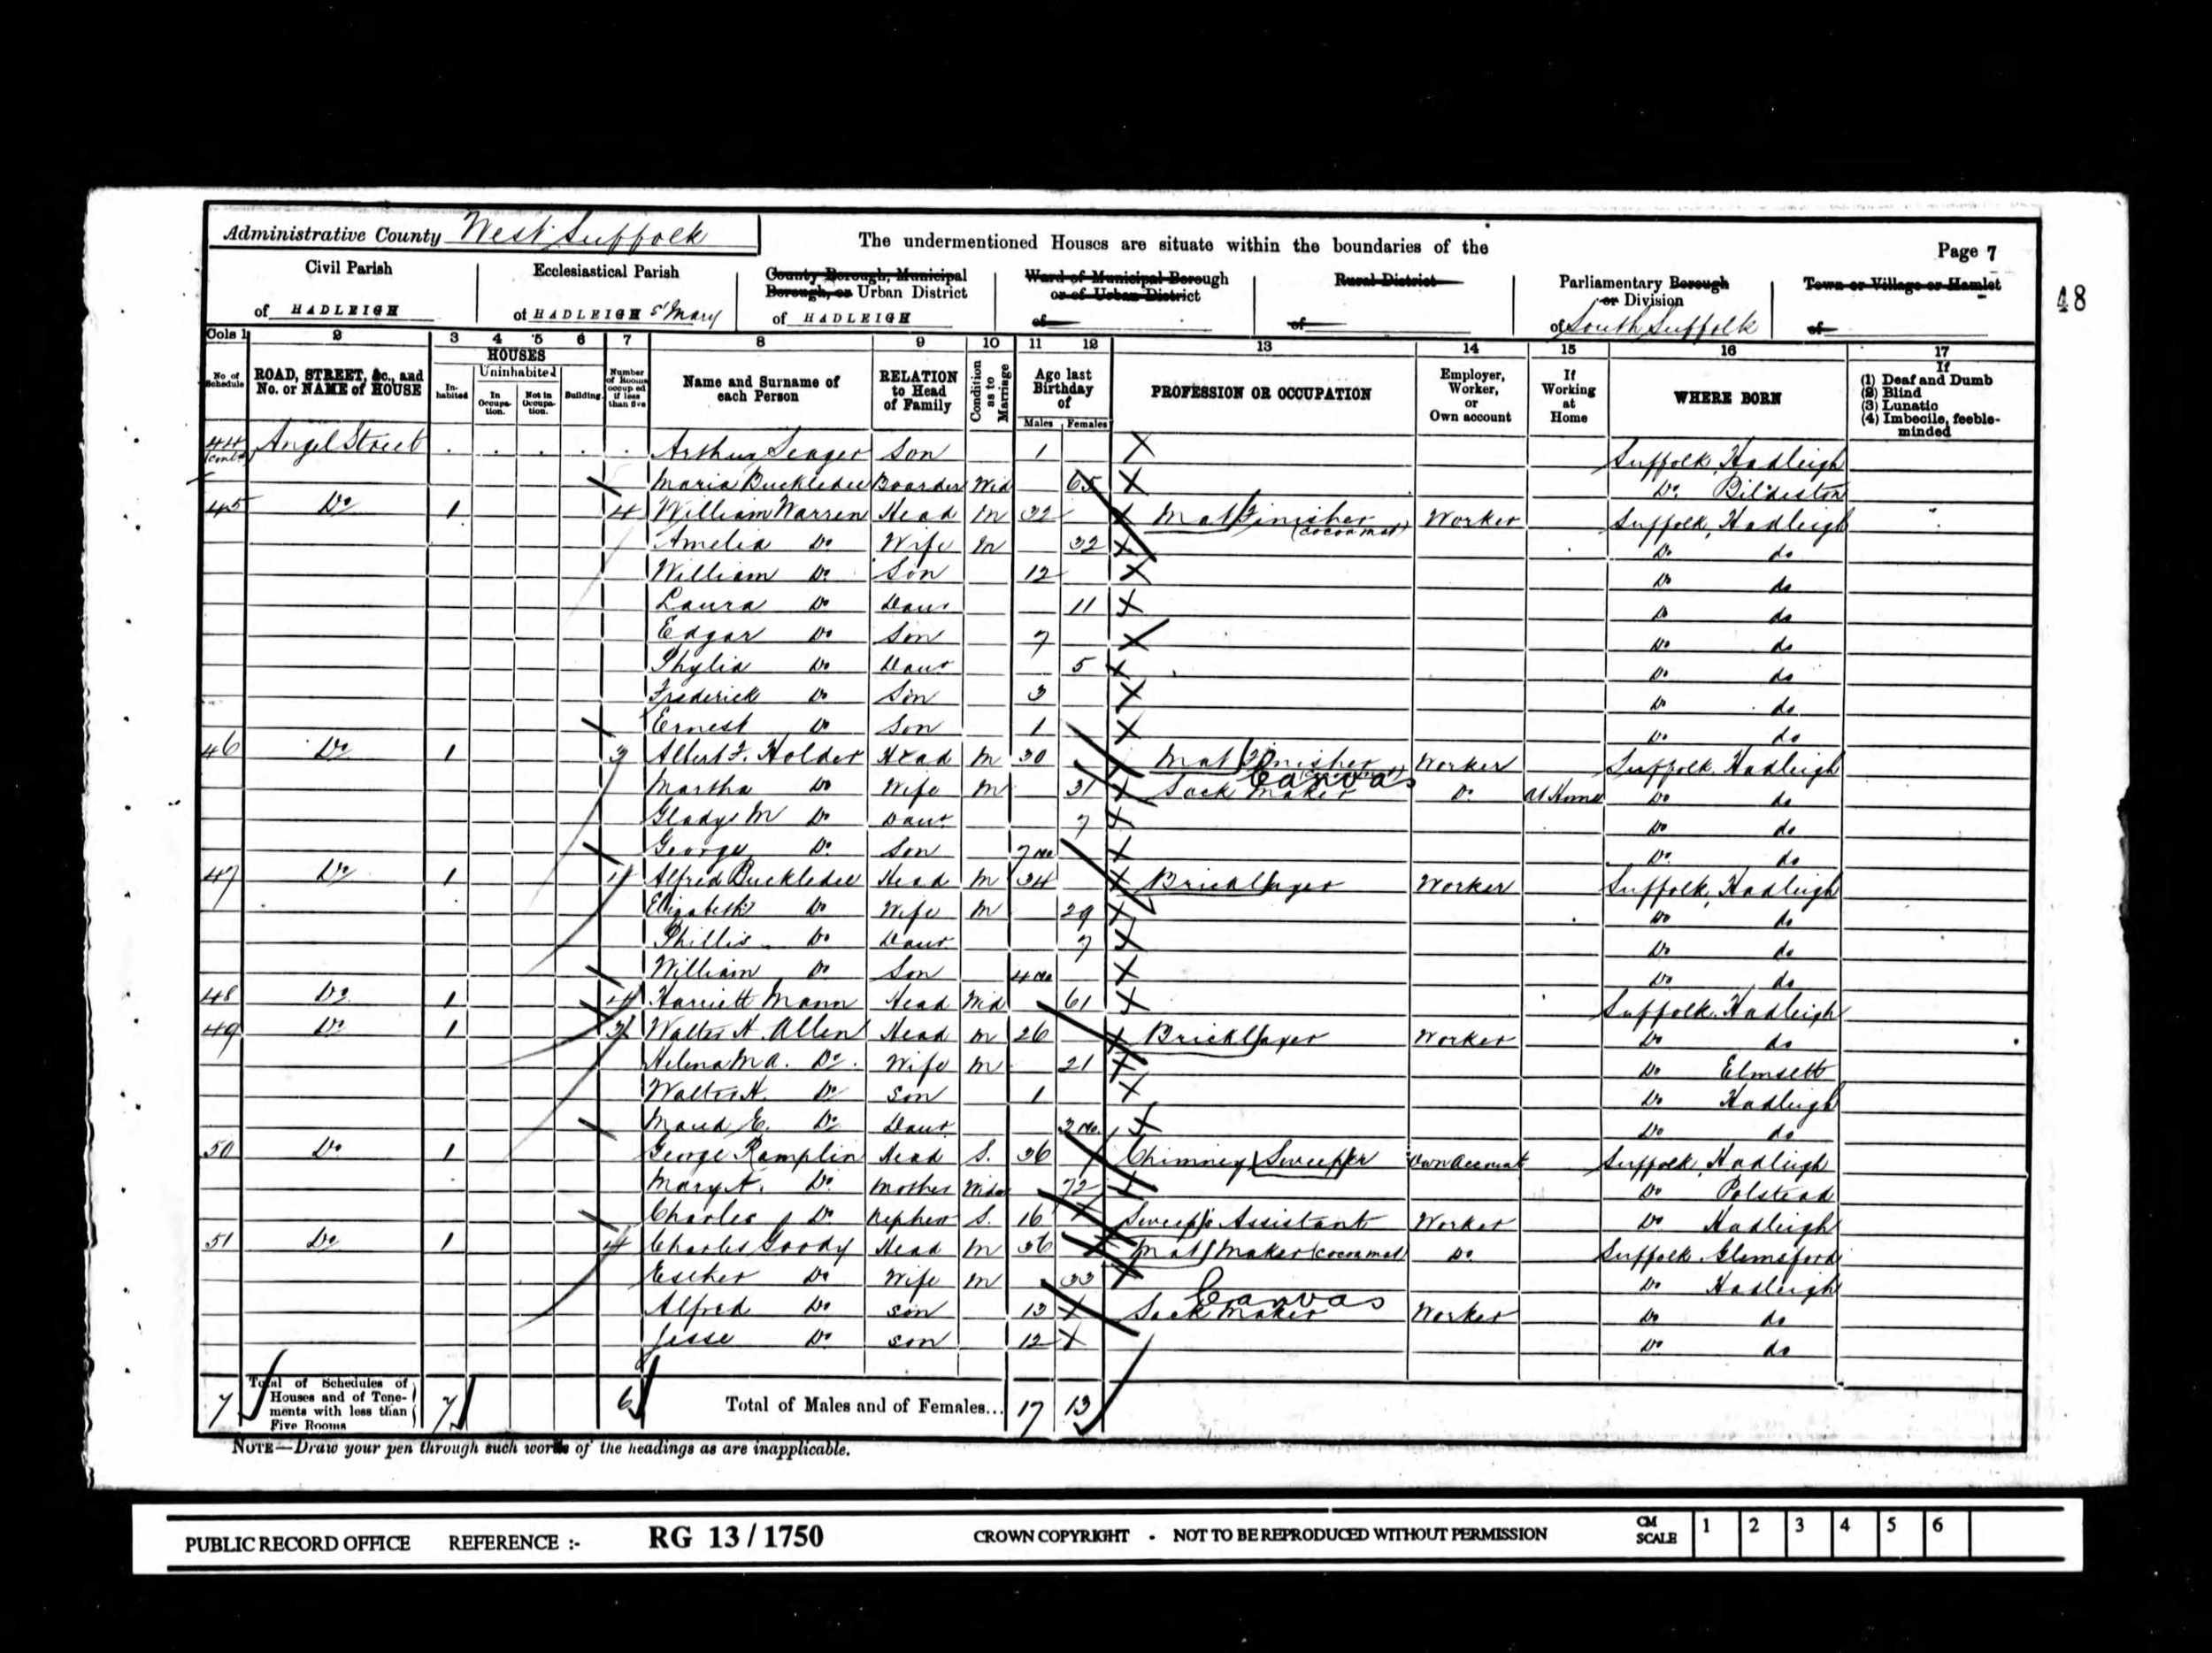 Goody Jesse 1901a census.jpg